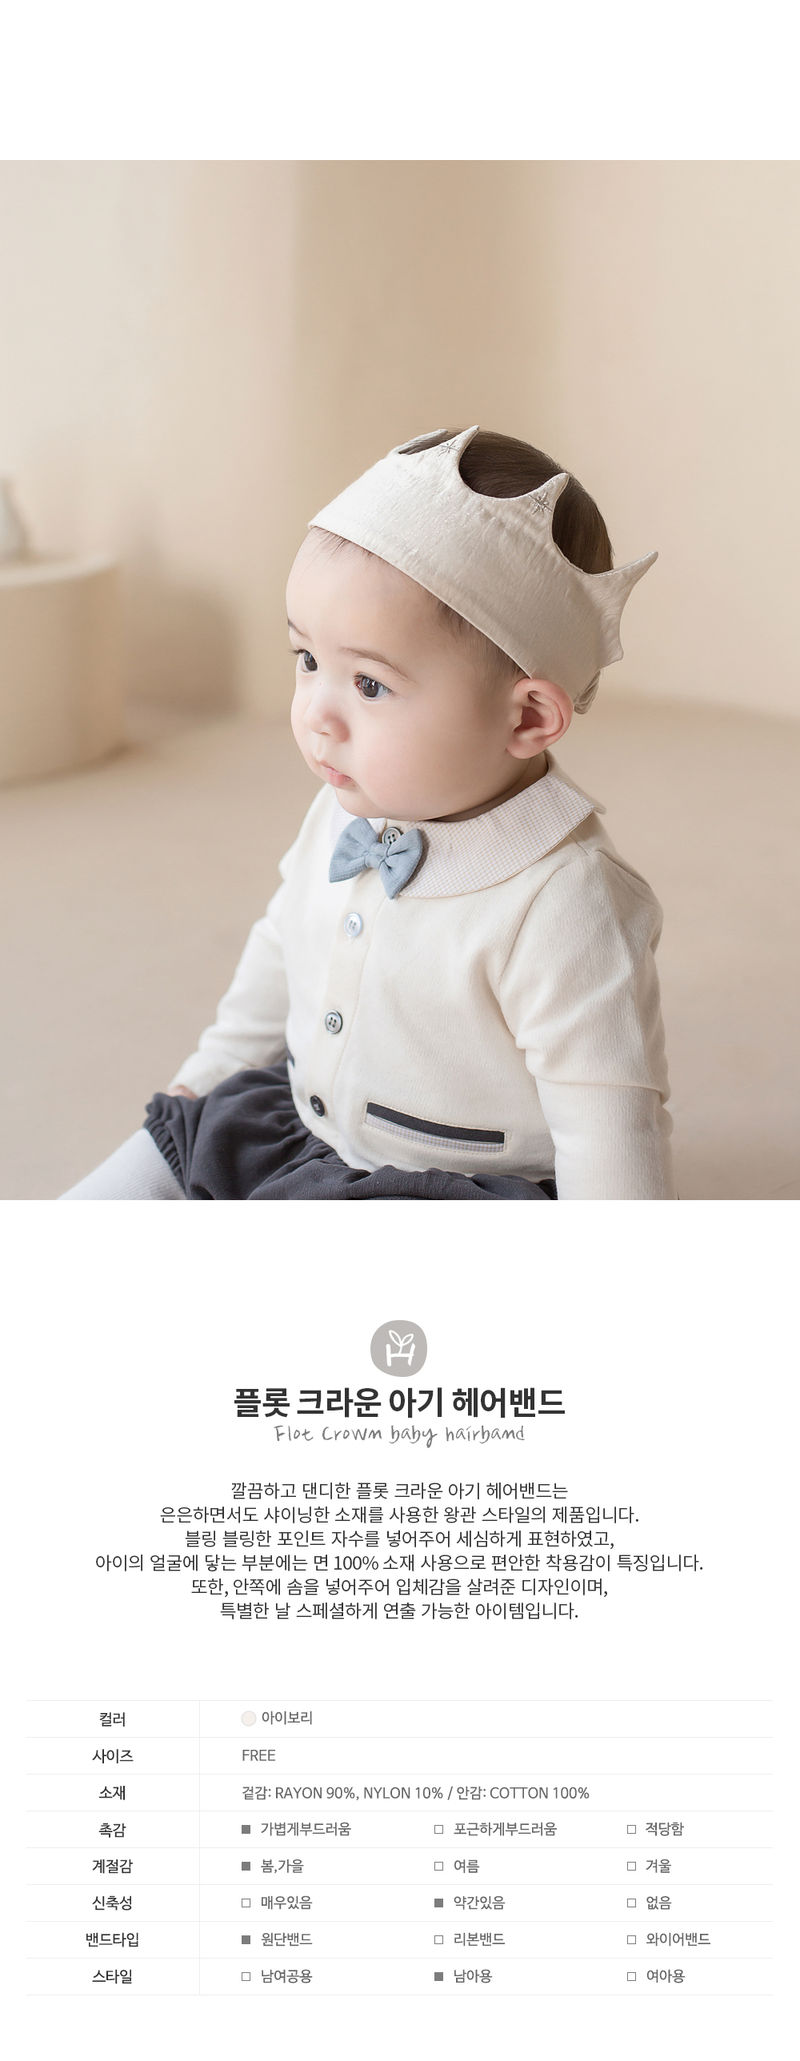 HAPPY PRINCE - Korean Children Fashion - #Kfashion4kids - Flat Crown Baby Hairband [set of 5]